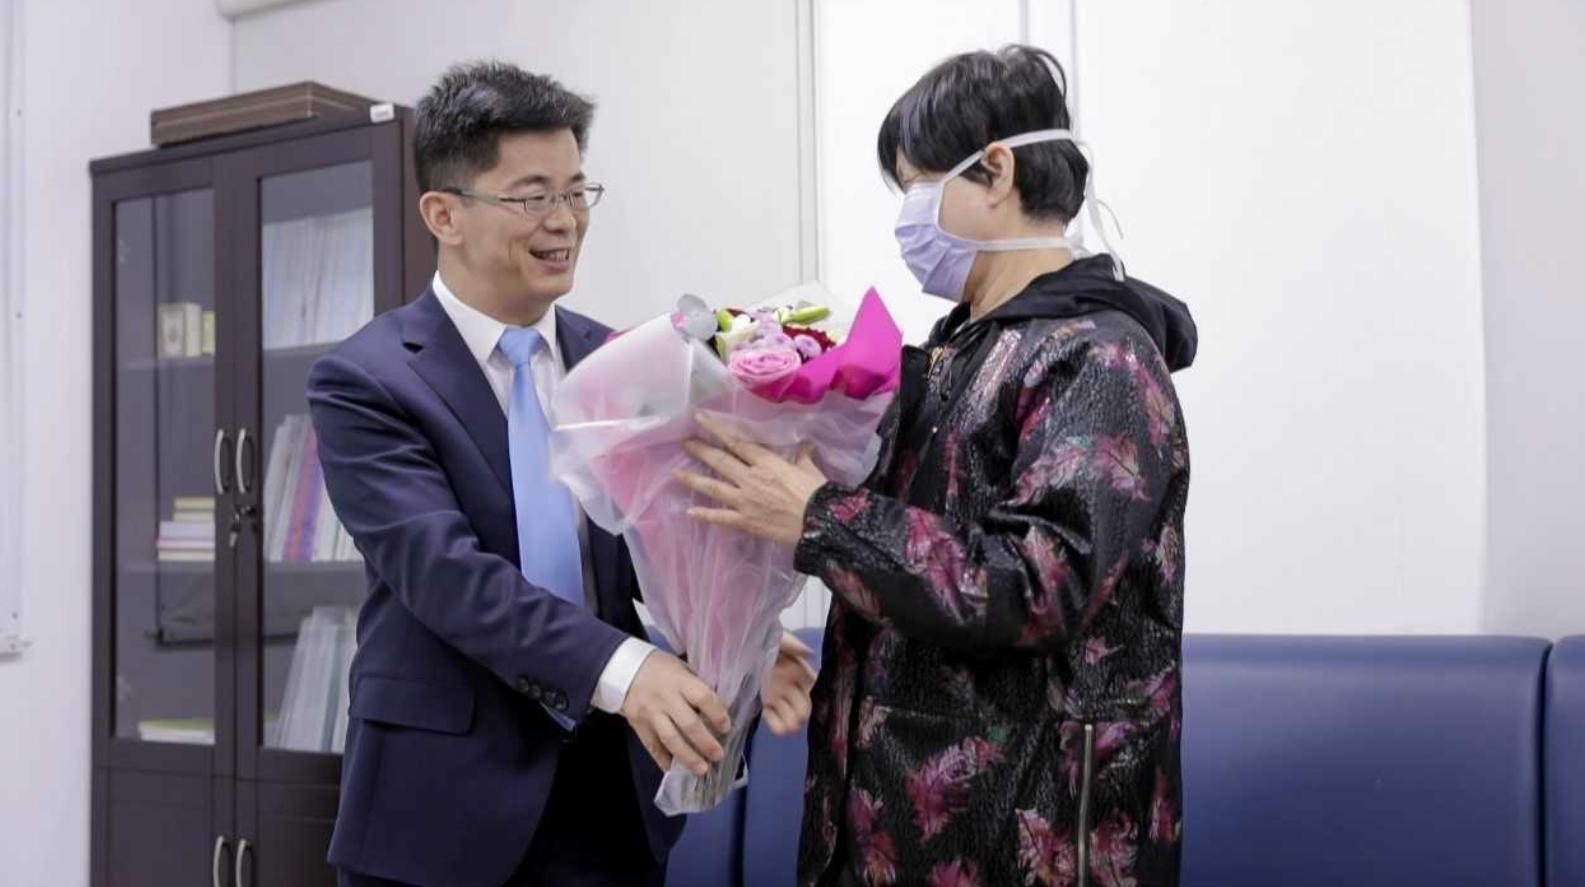 The Chinese Consul General in Dubai Li Xuhang visited Yujia. (WAM)